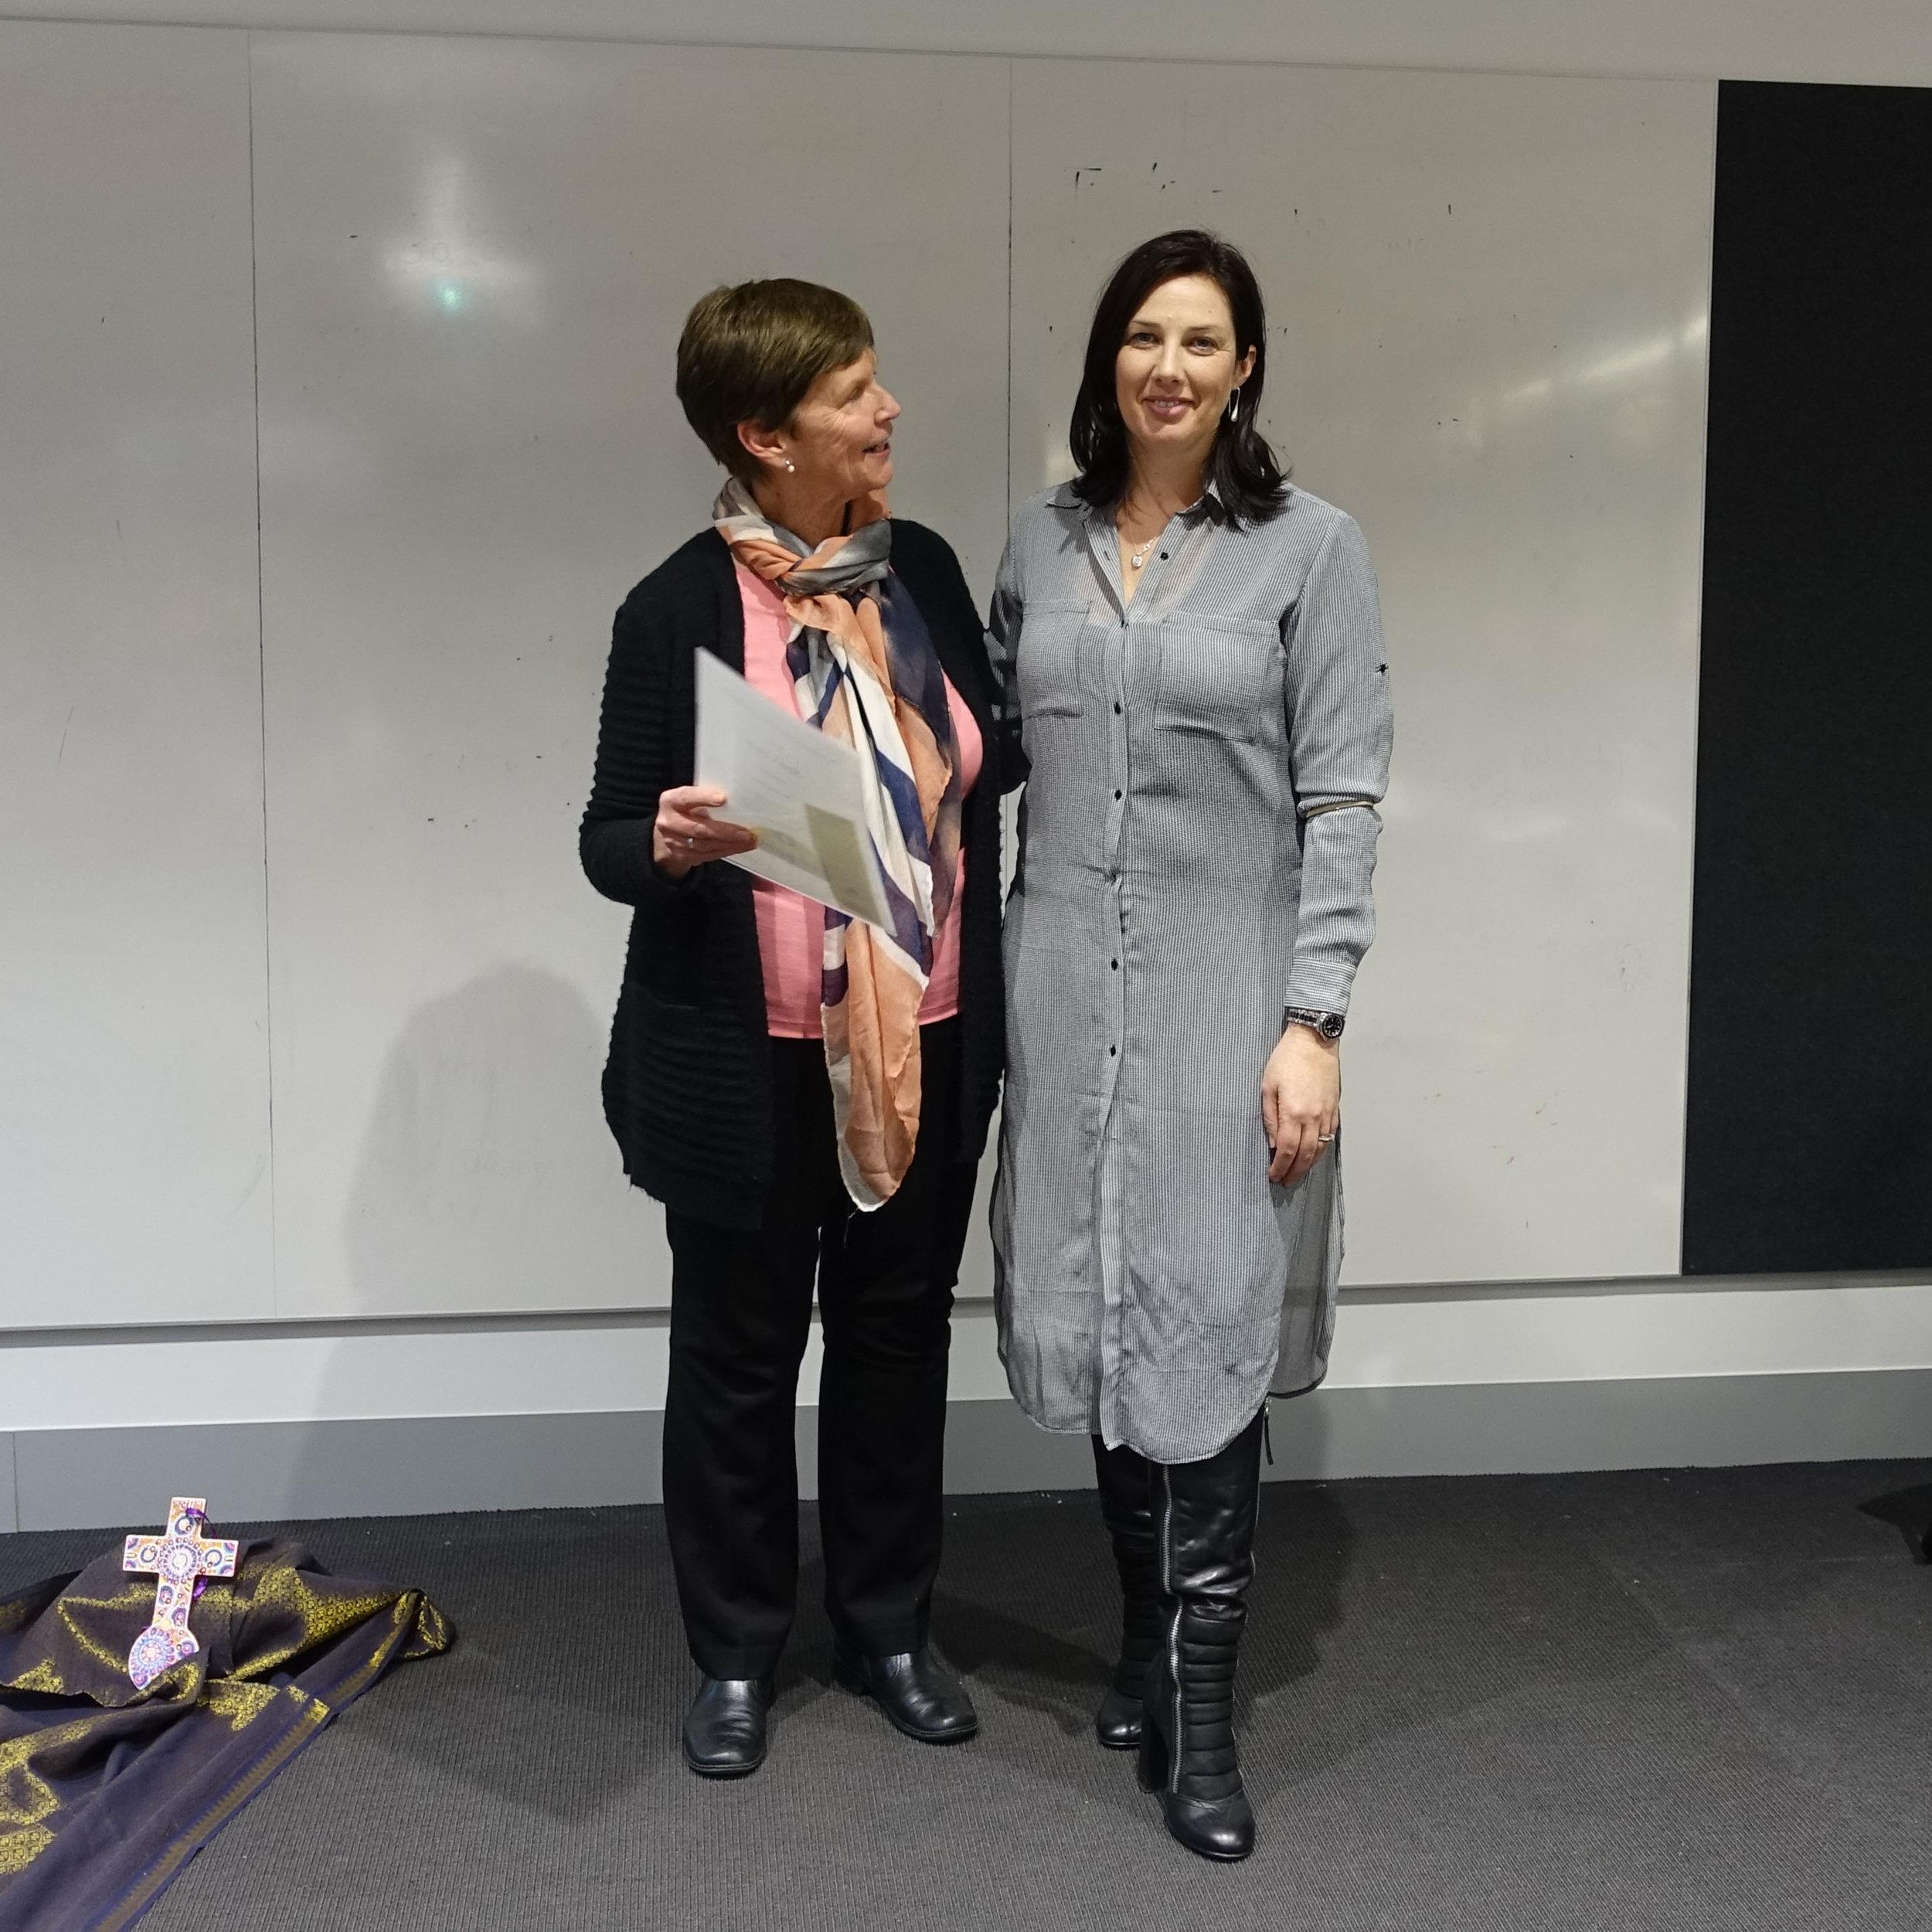 Melbourne Gathering Marcellin College-1-19.jpg